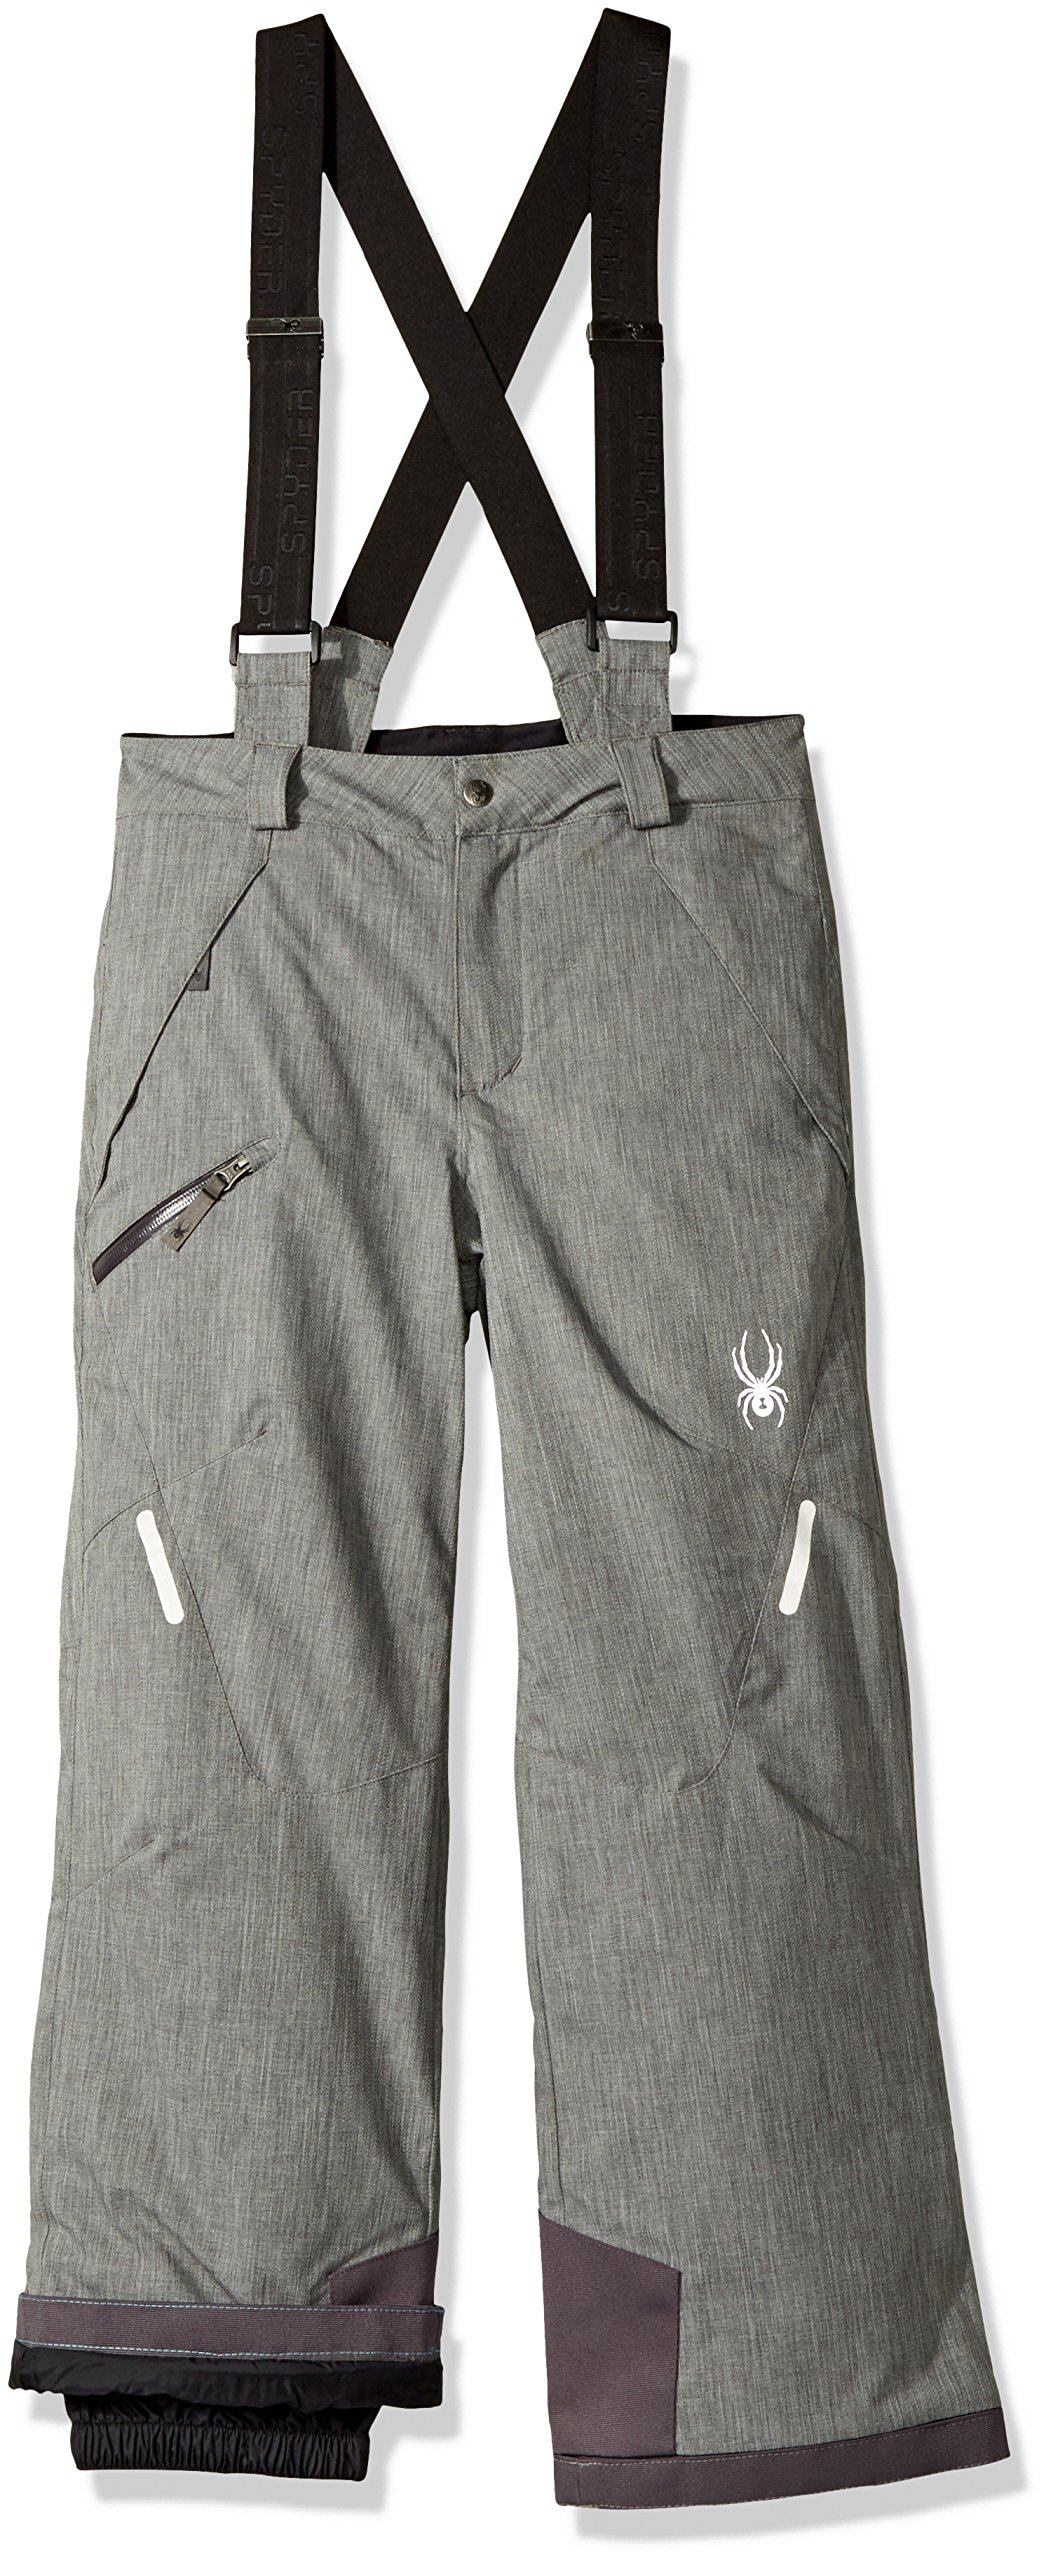 Spyder Boy's Propulsion Ski Pant, Polar Herringbone, Size 18